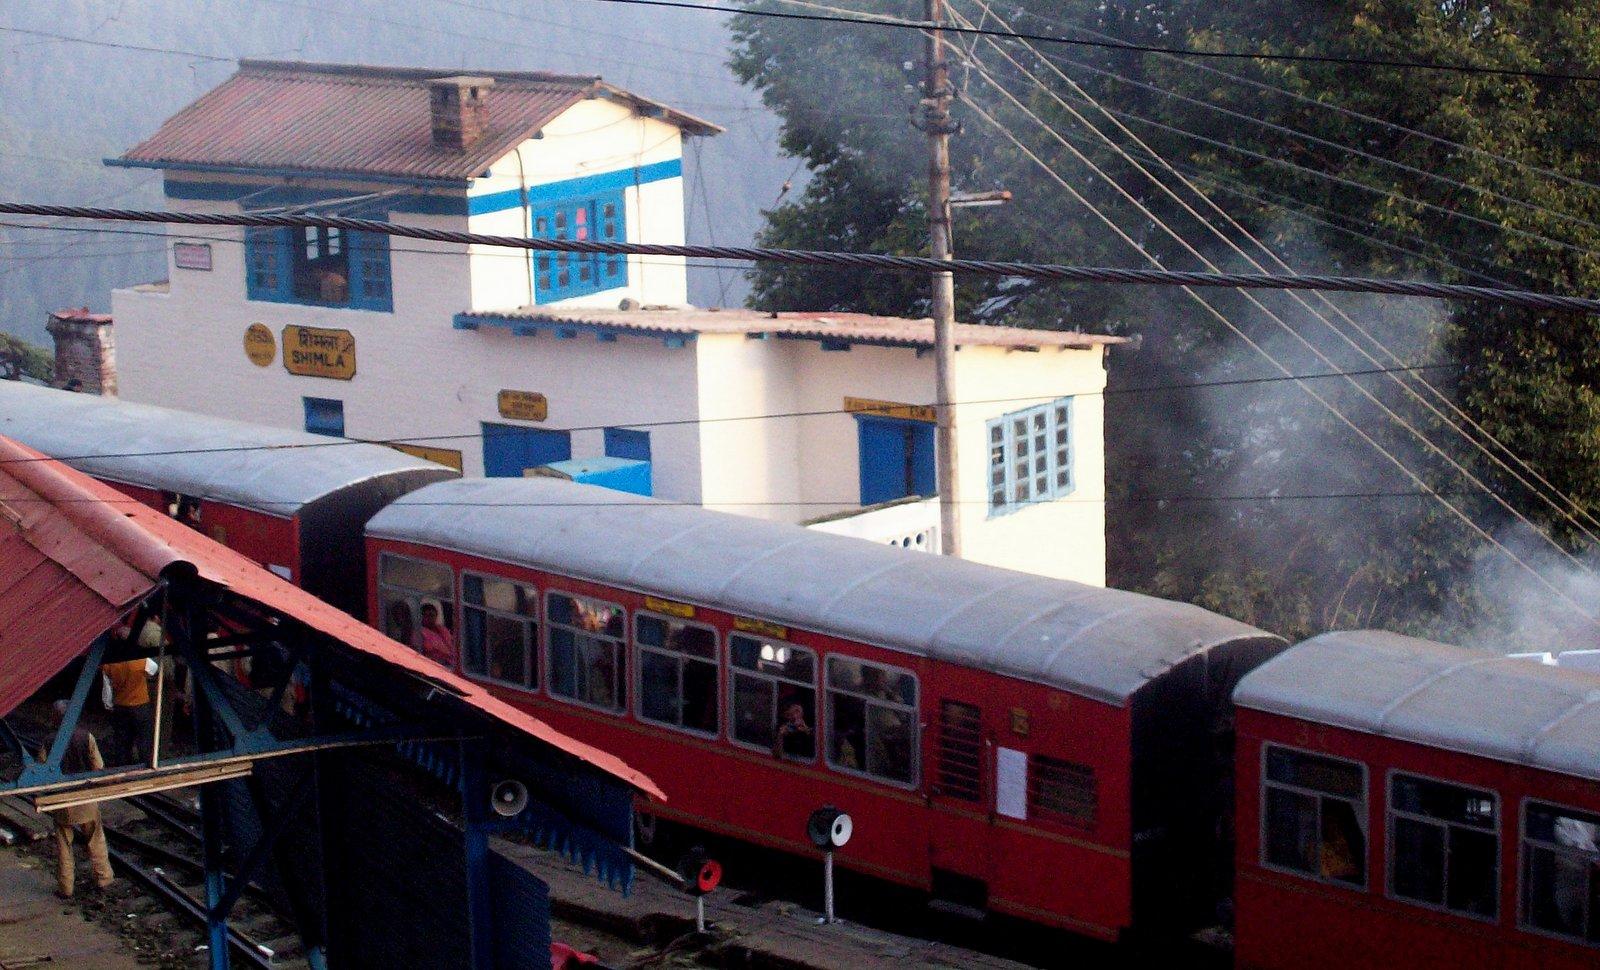 Bahnhof Shimla im Himalaya-Vorgebirge